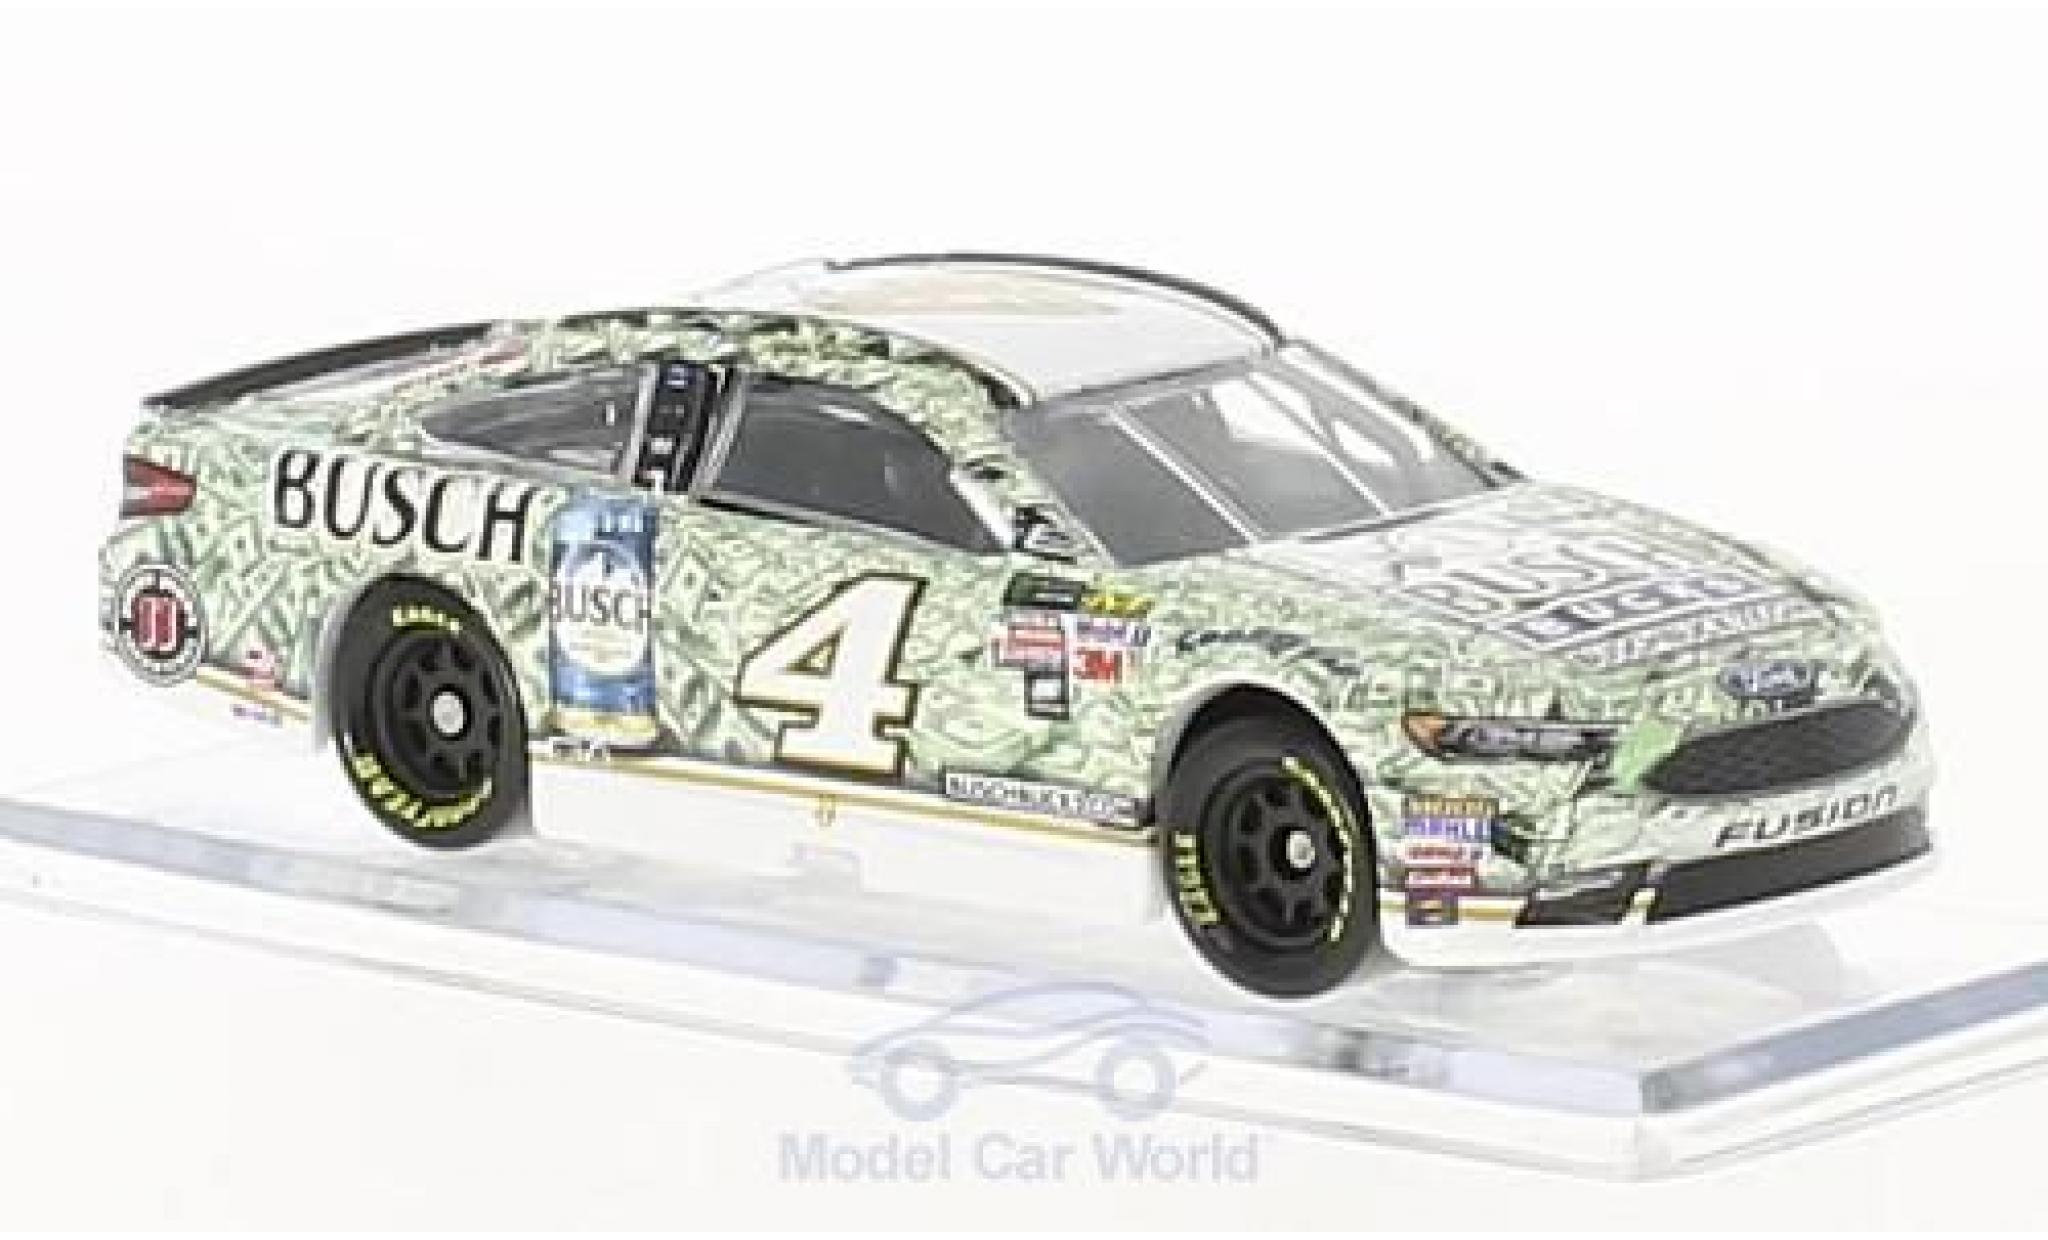 Ford Fusion 1/64 Lionel Racing No.4 Stewart-Haas Racing Busch Bucks Nascar 2017 K.Harvick